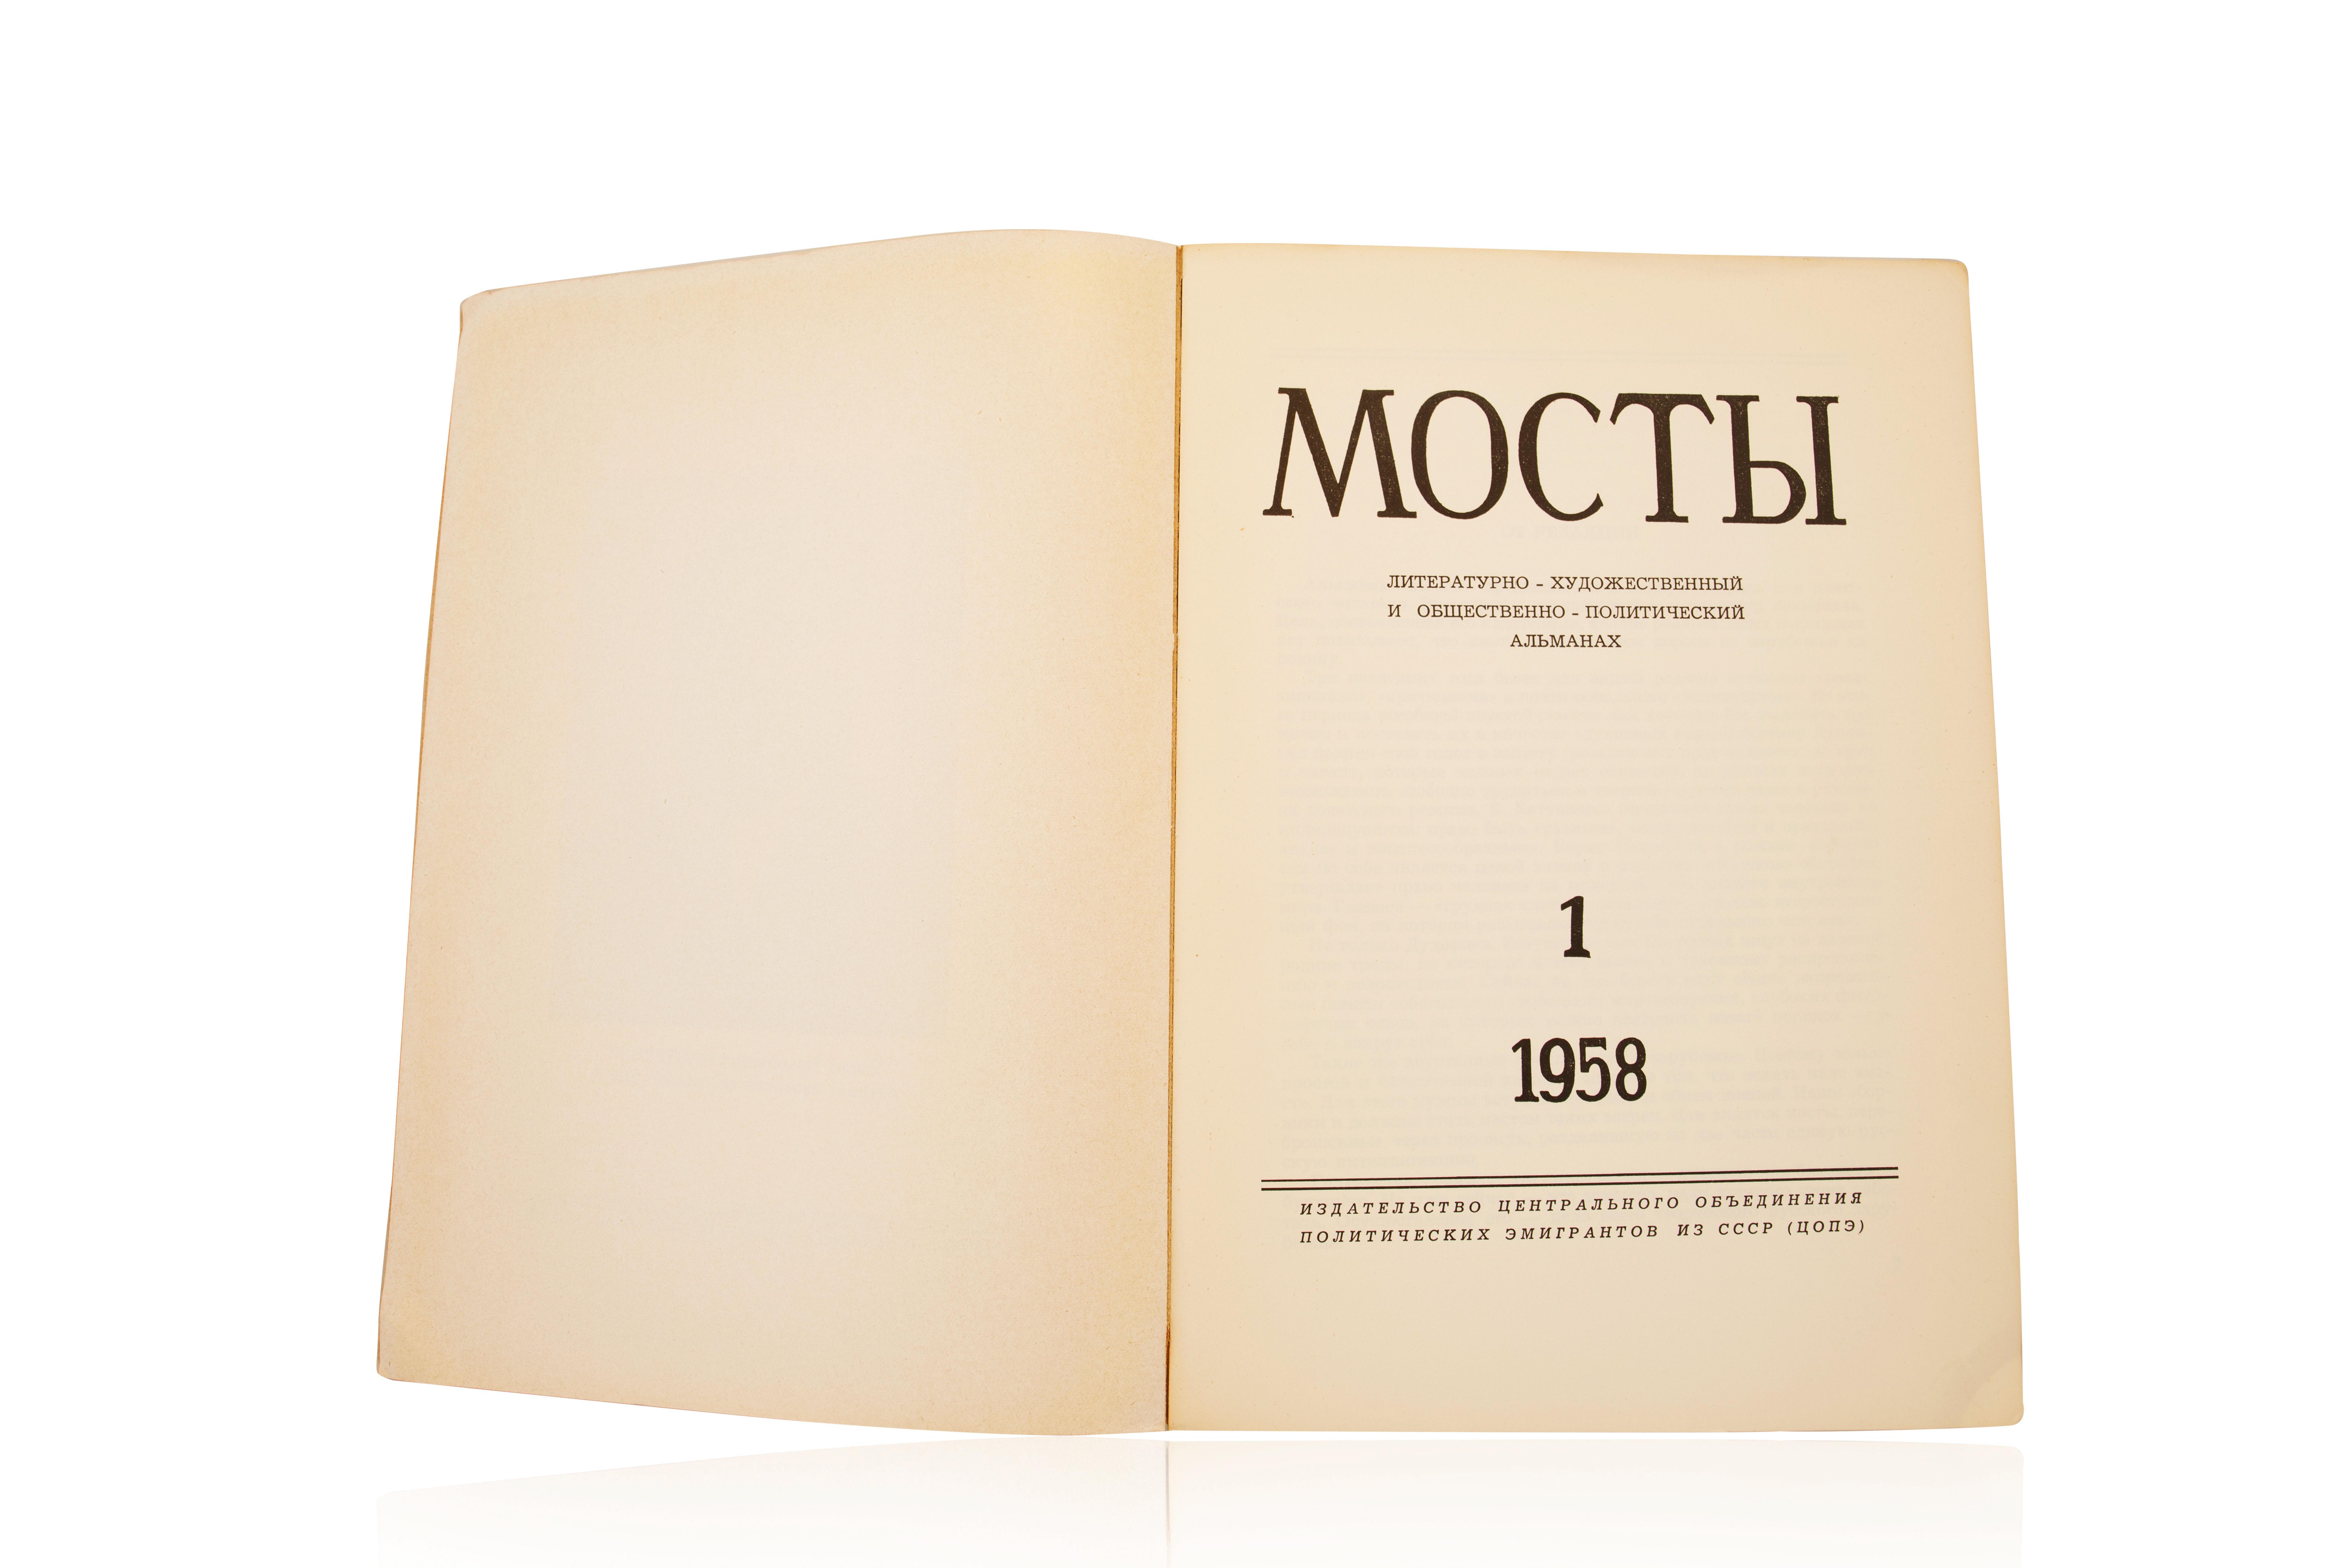 A COMPLETE SET OF MOSTY [BRIDGES] ALMANAC, 1958-1970 - Image 3 of 4